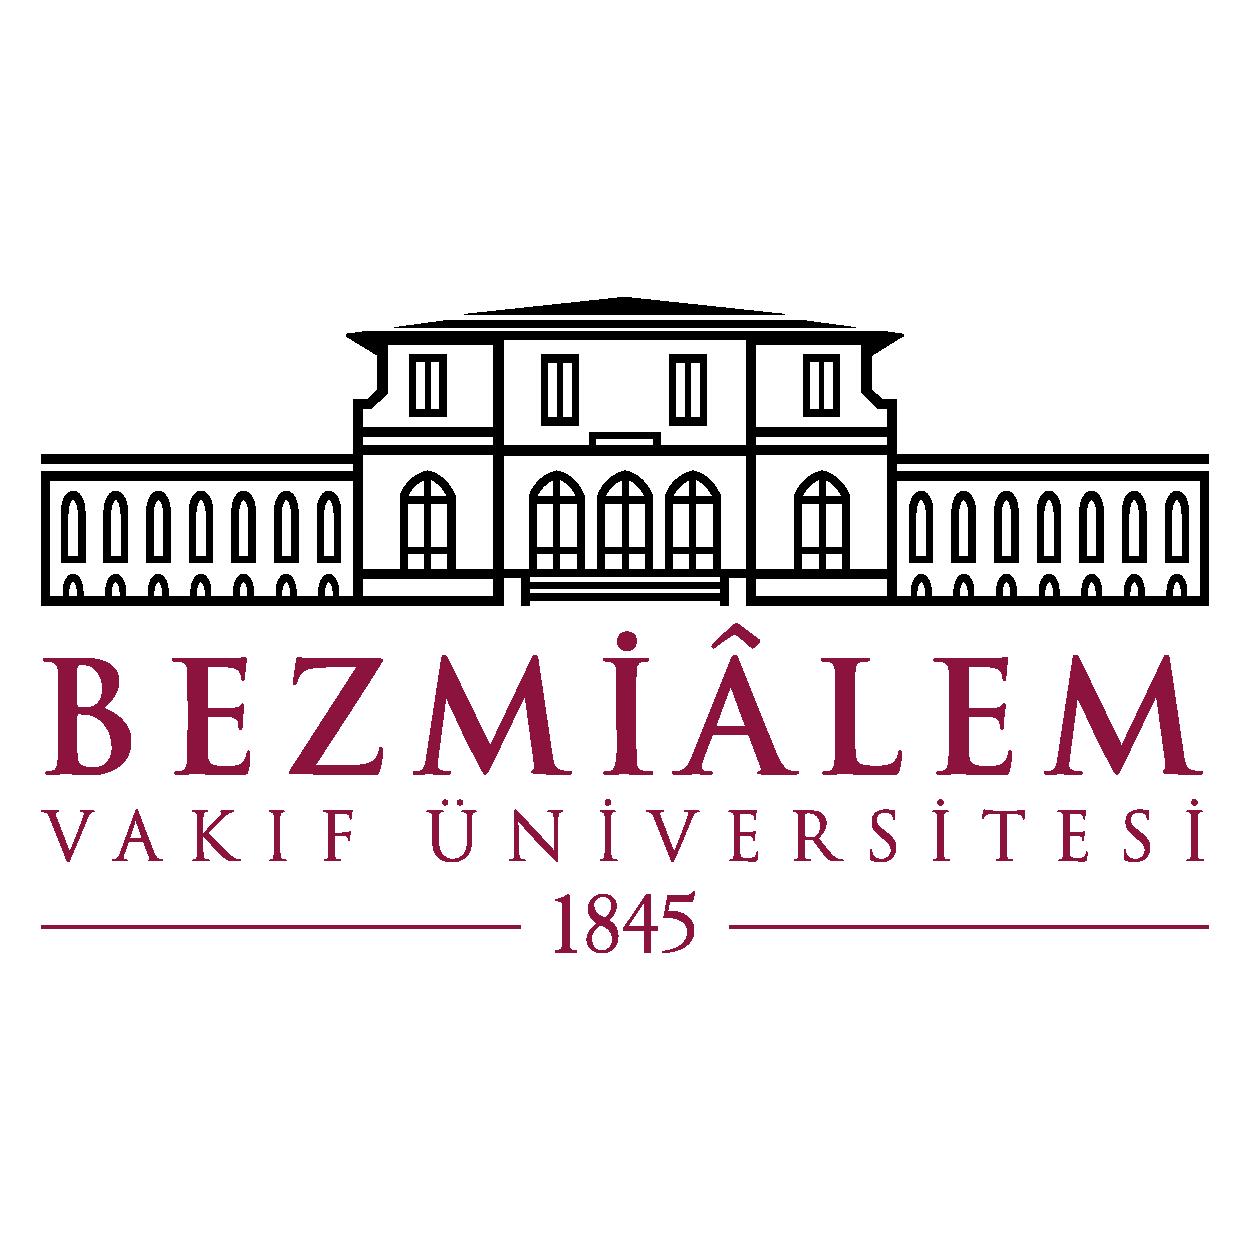 Bezmialem Vakıf Üniversitesi Logo (İstanbul) png